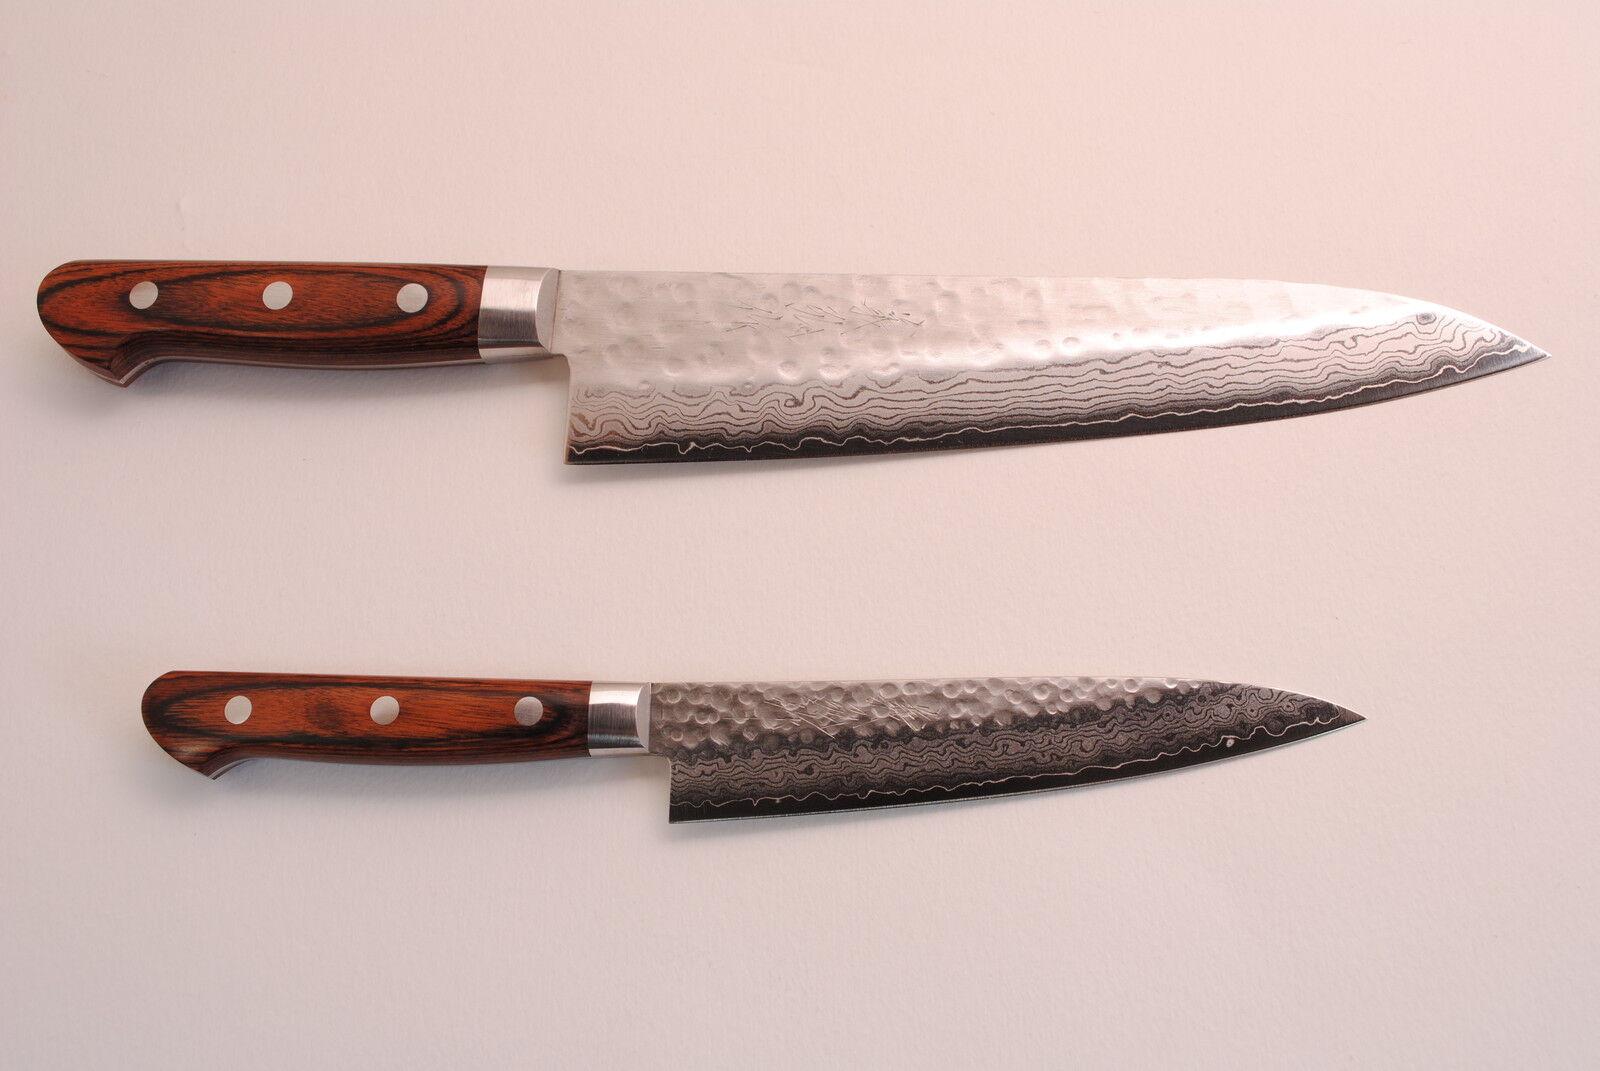 vg10 hammered damascus set gyuto 210 petty japanese sushi chef knife yoshihiro ebay. Black Bedroom Furniture Sets. Home Design Ideas